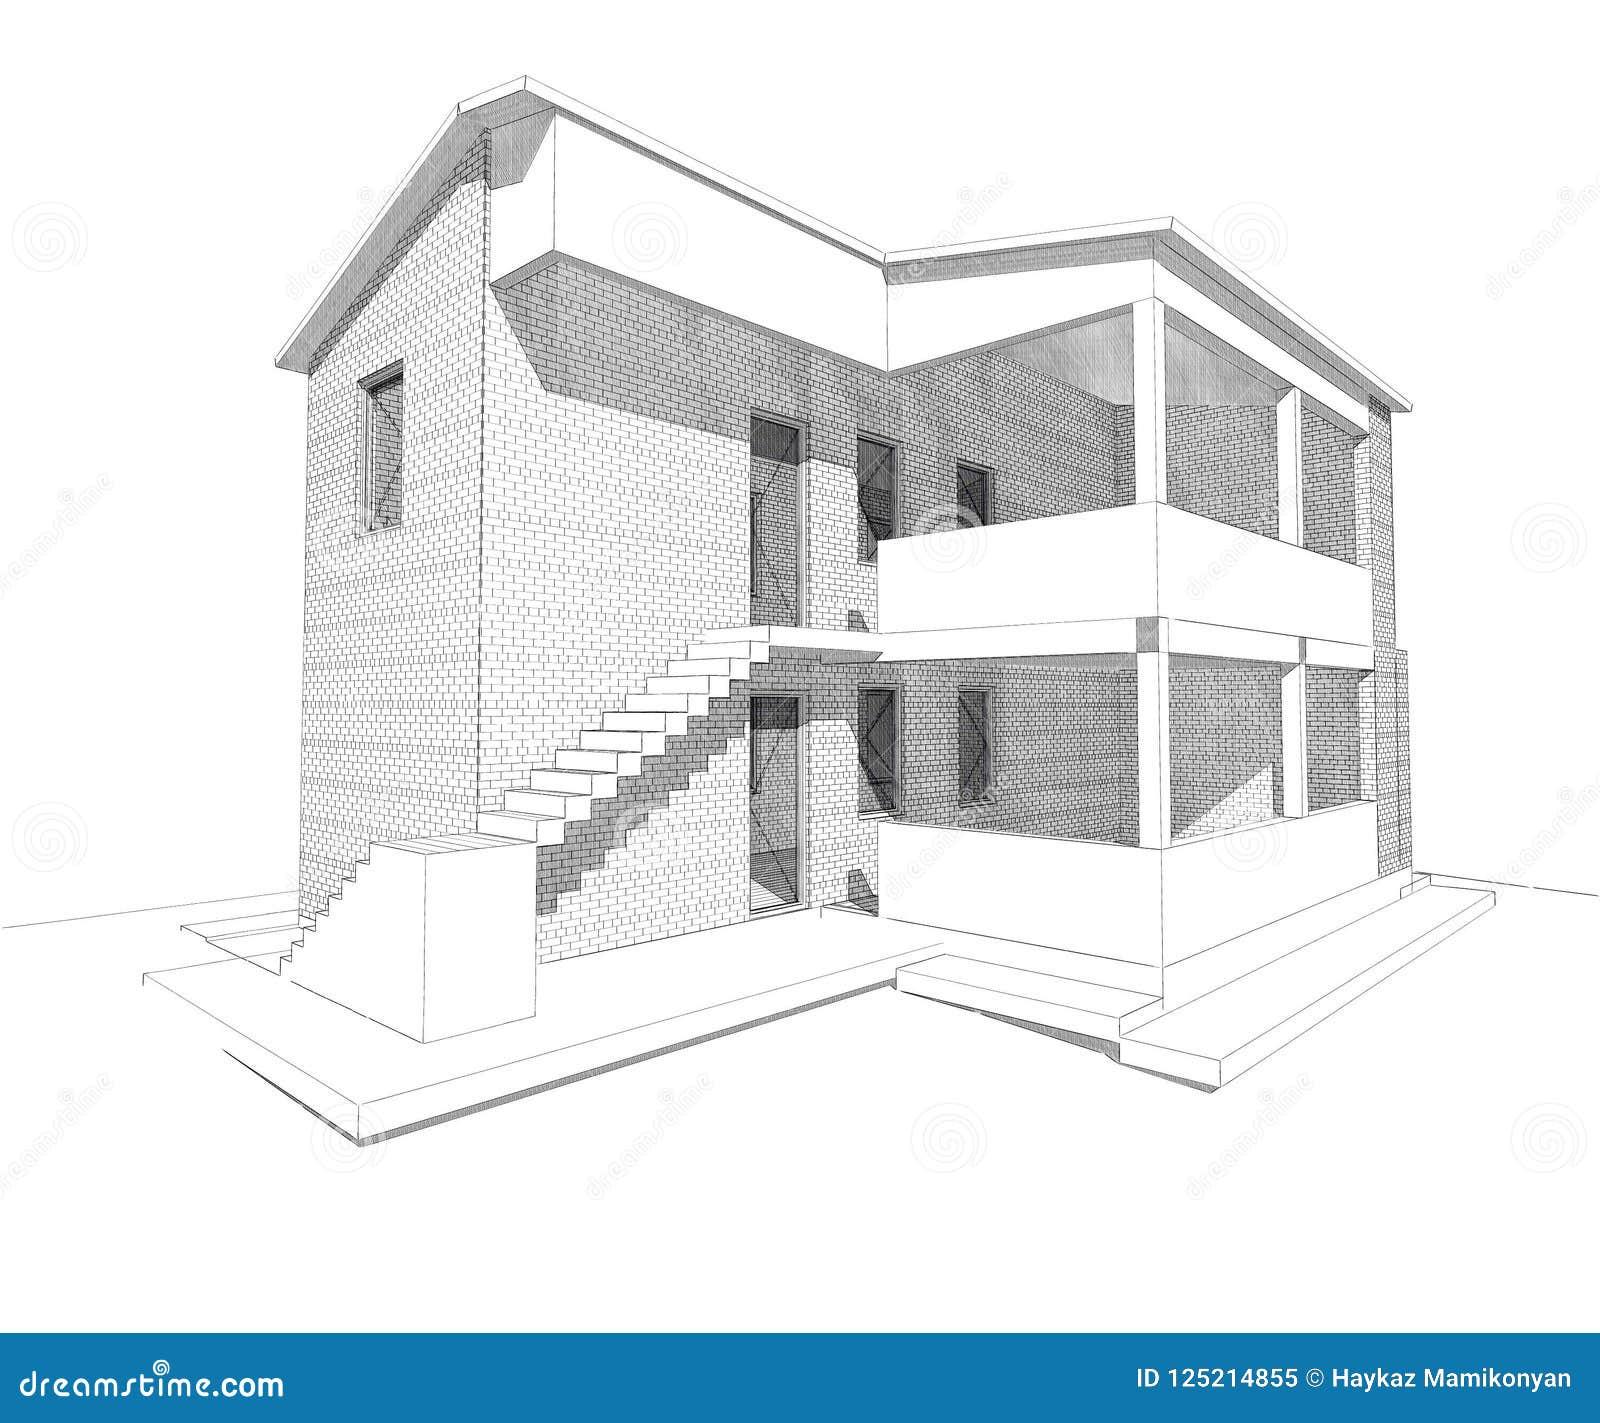 building residental design d d house drawing line exterior design d home rendering residential building caffe mini park home 125214855